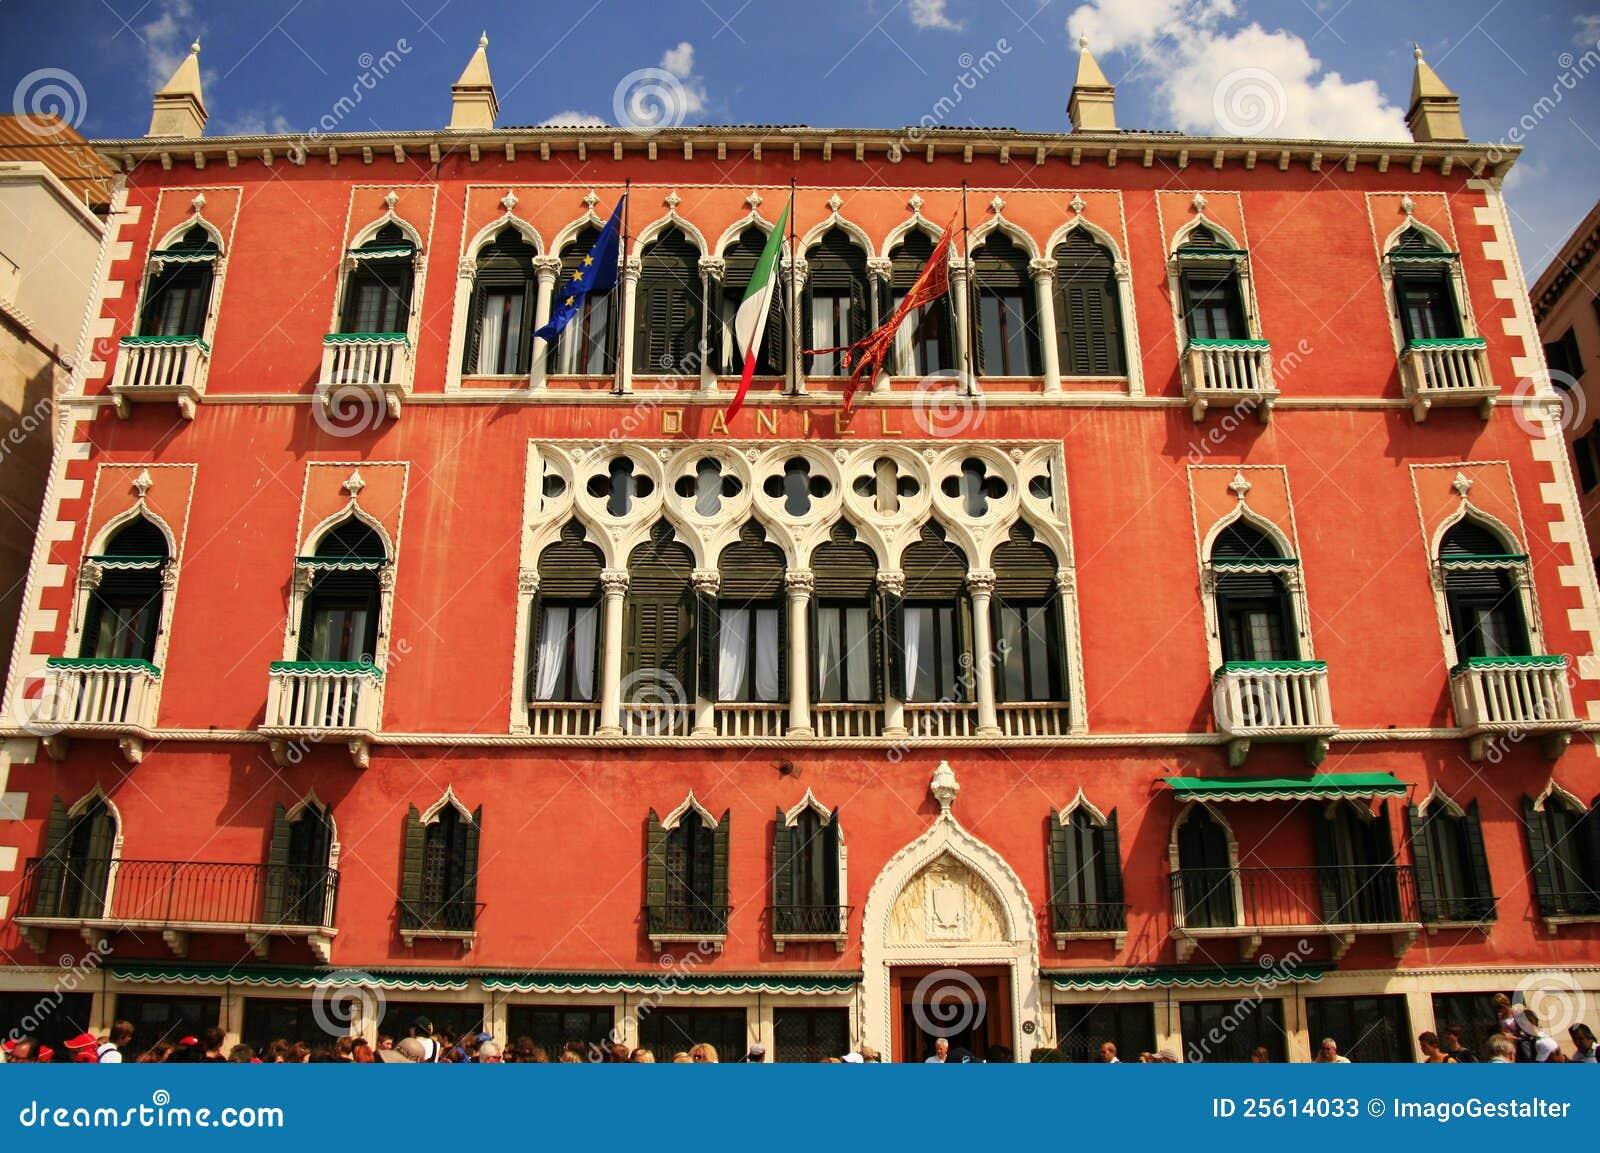 Danieli Hotel In Venice Italy Editorial Stock Photo Image